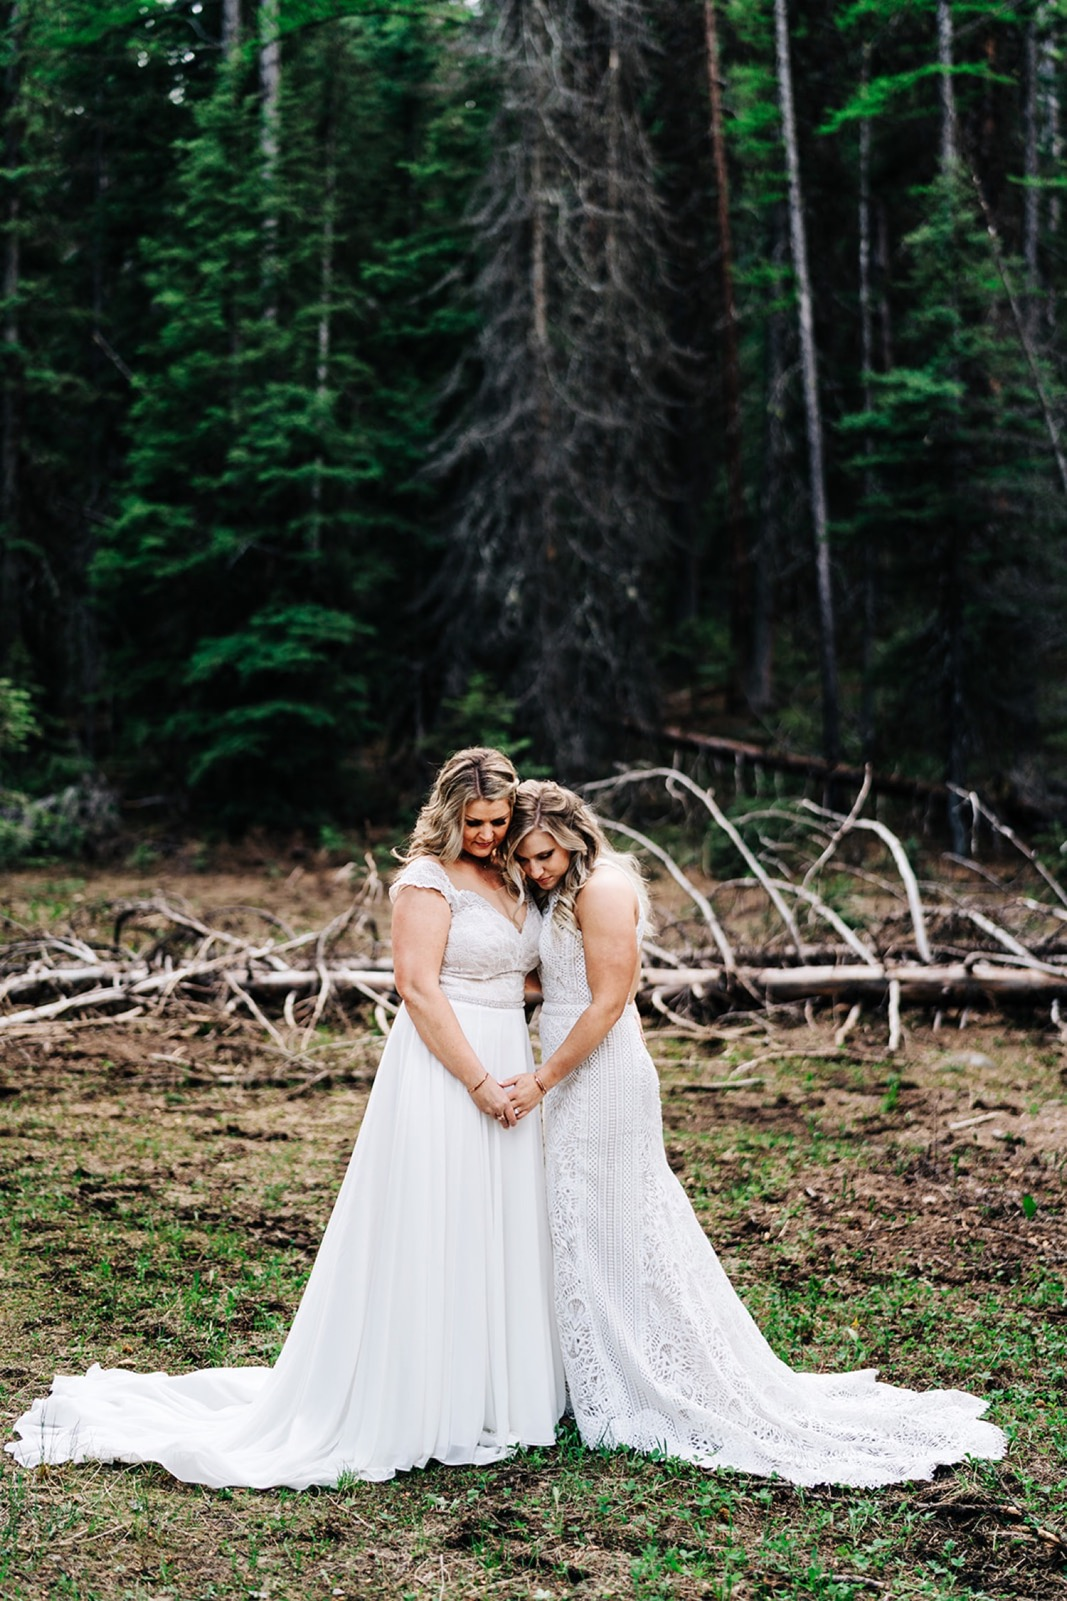 203_falissa_heather_wedding-569.jpg